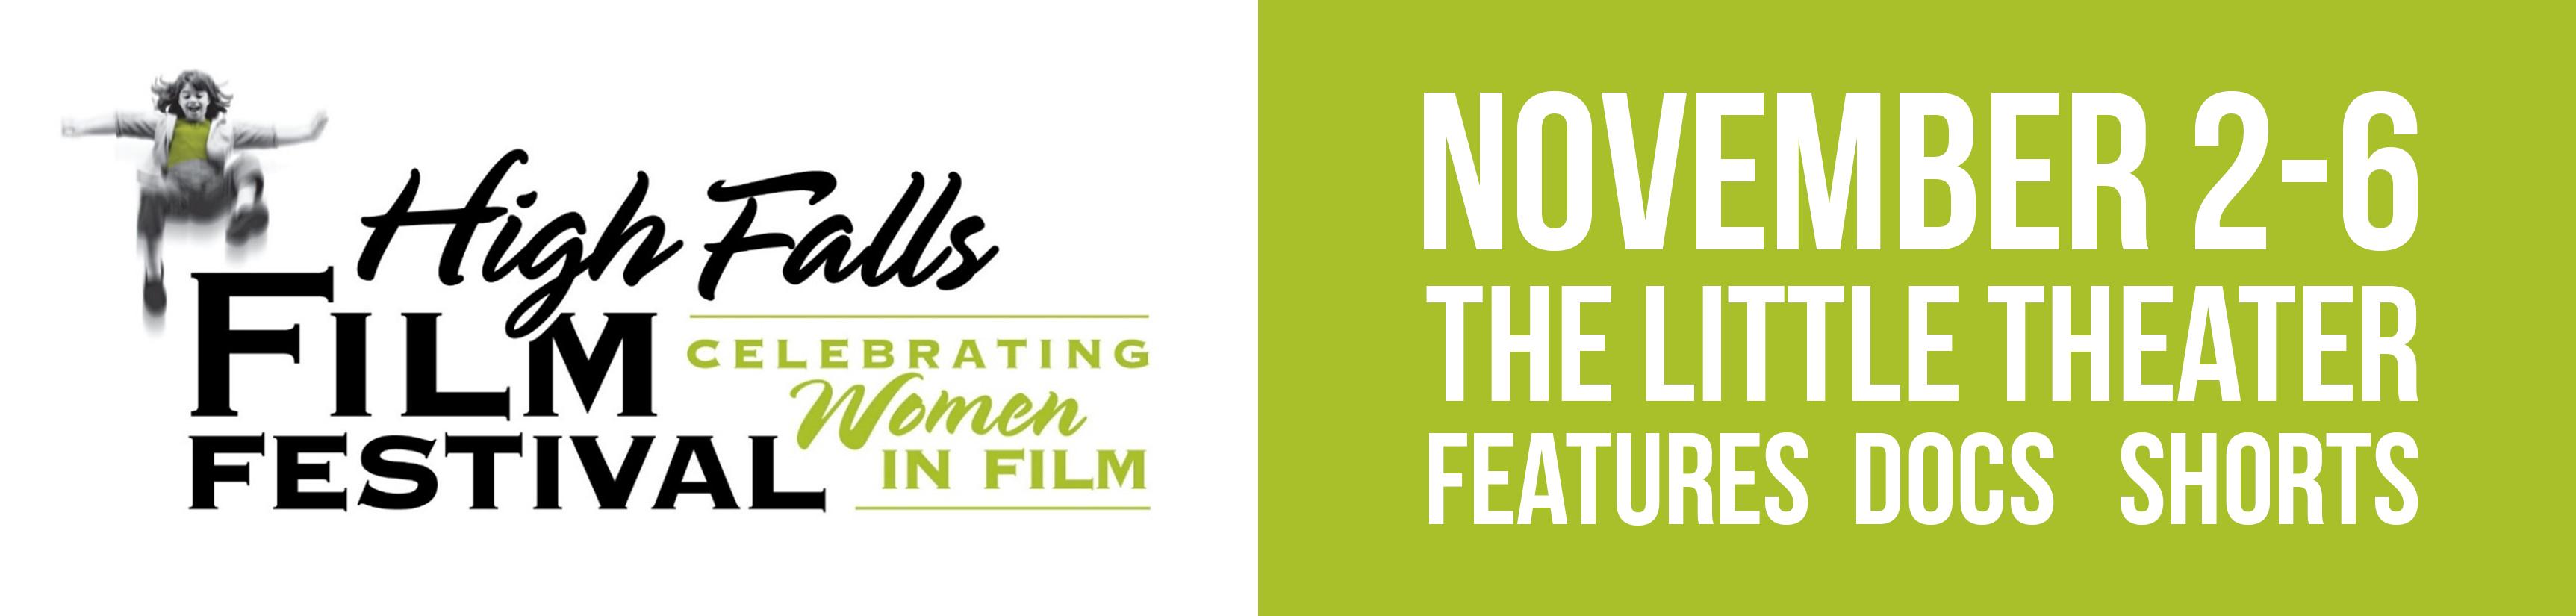 Kodak 16mm Filmmaking Workshop | 2017 High Falls Film Festival